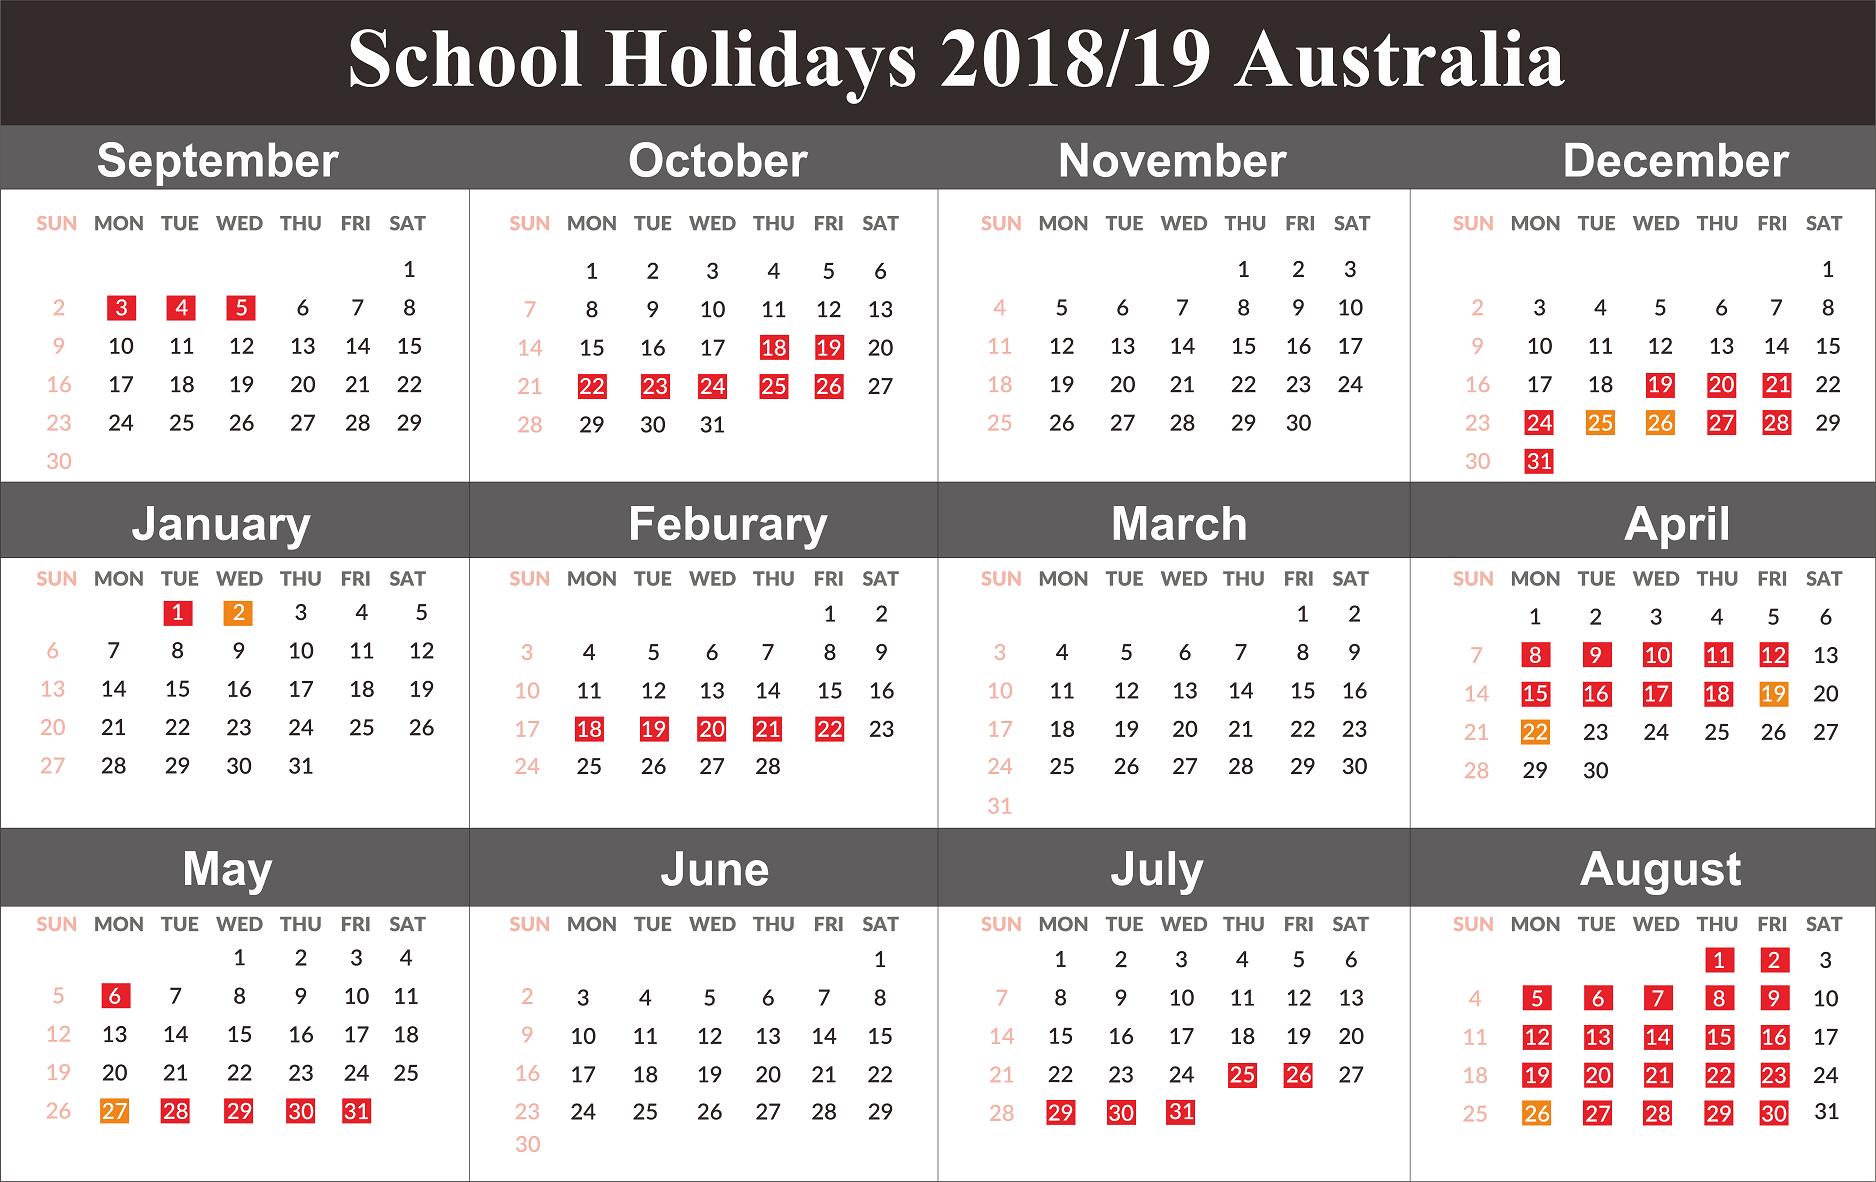 Australia 2019 School Holidays Calendar Holiday Calendar Printable School Holiday Calendar Holiday Calendar